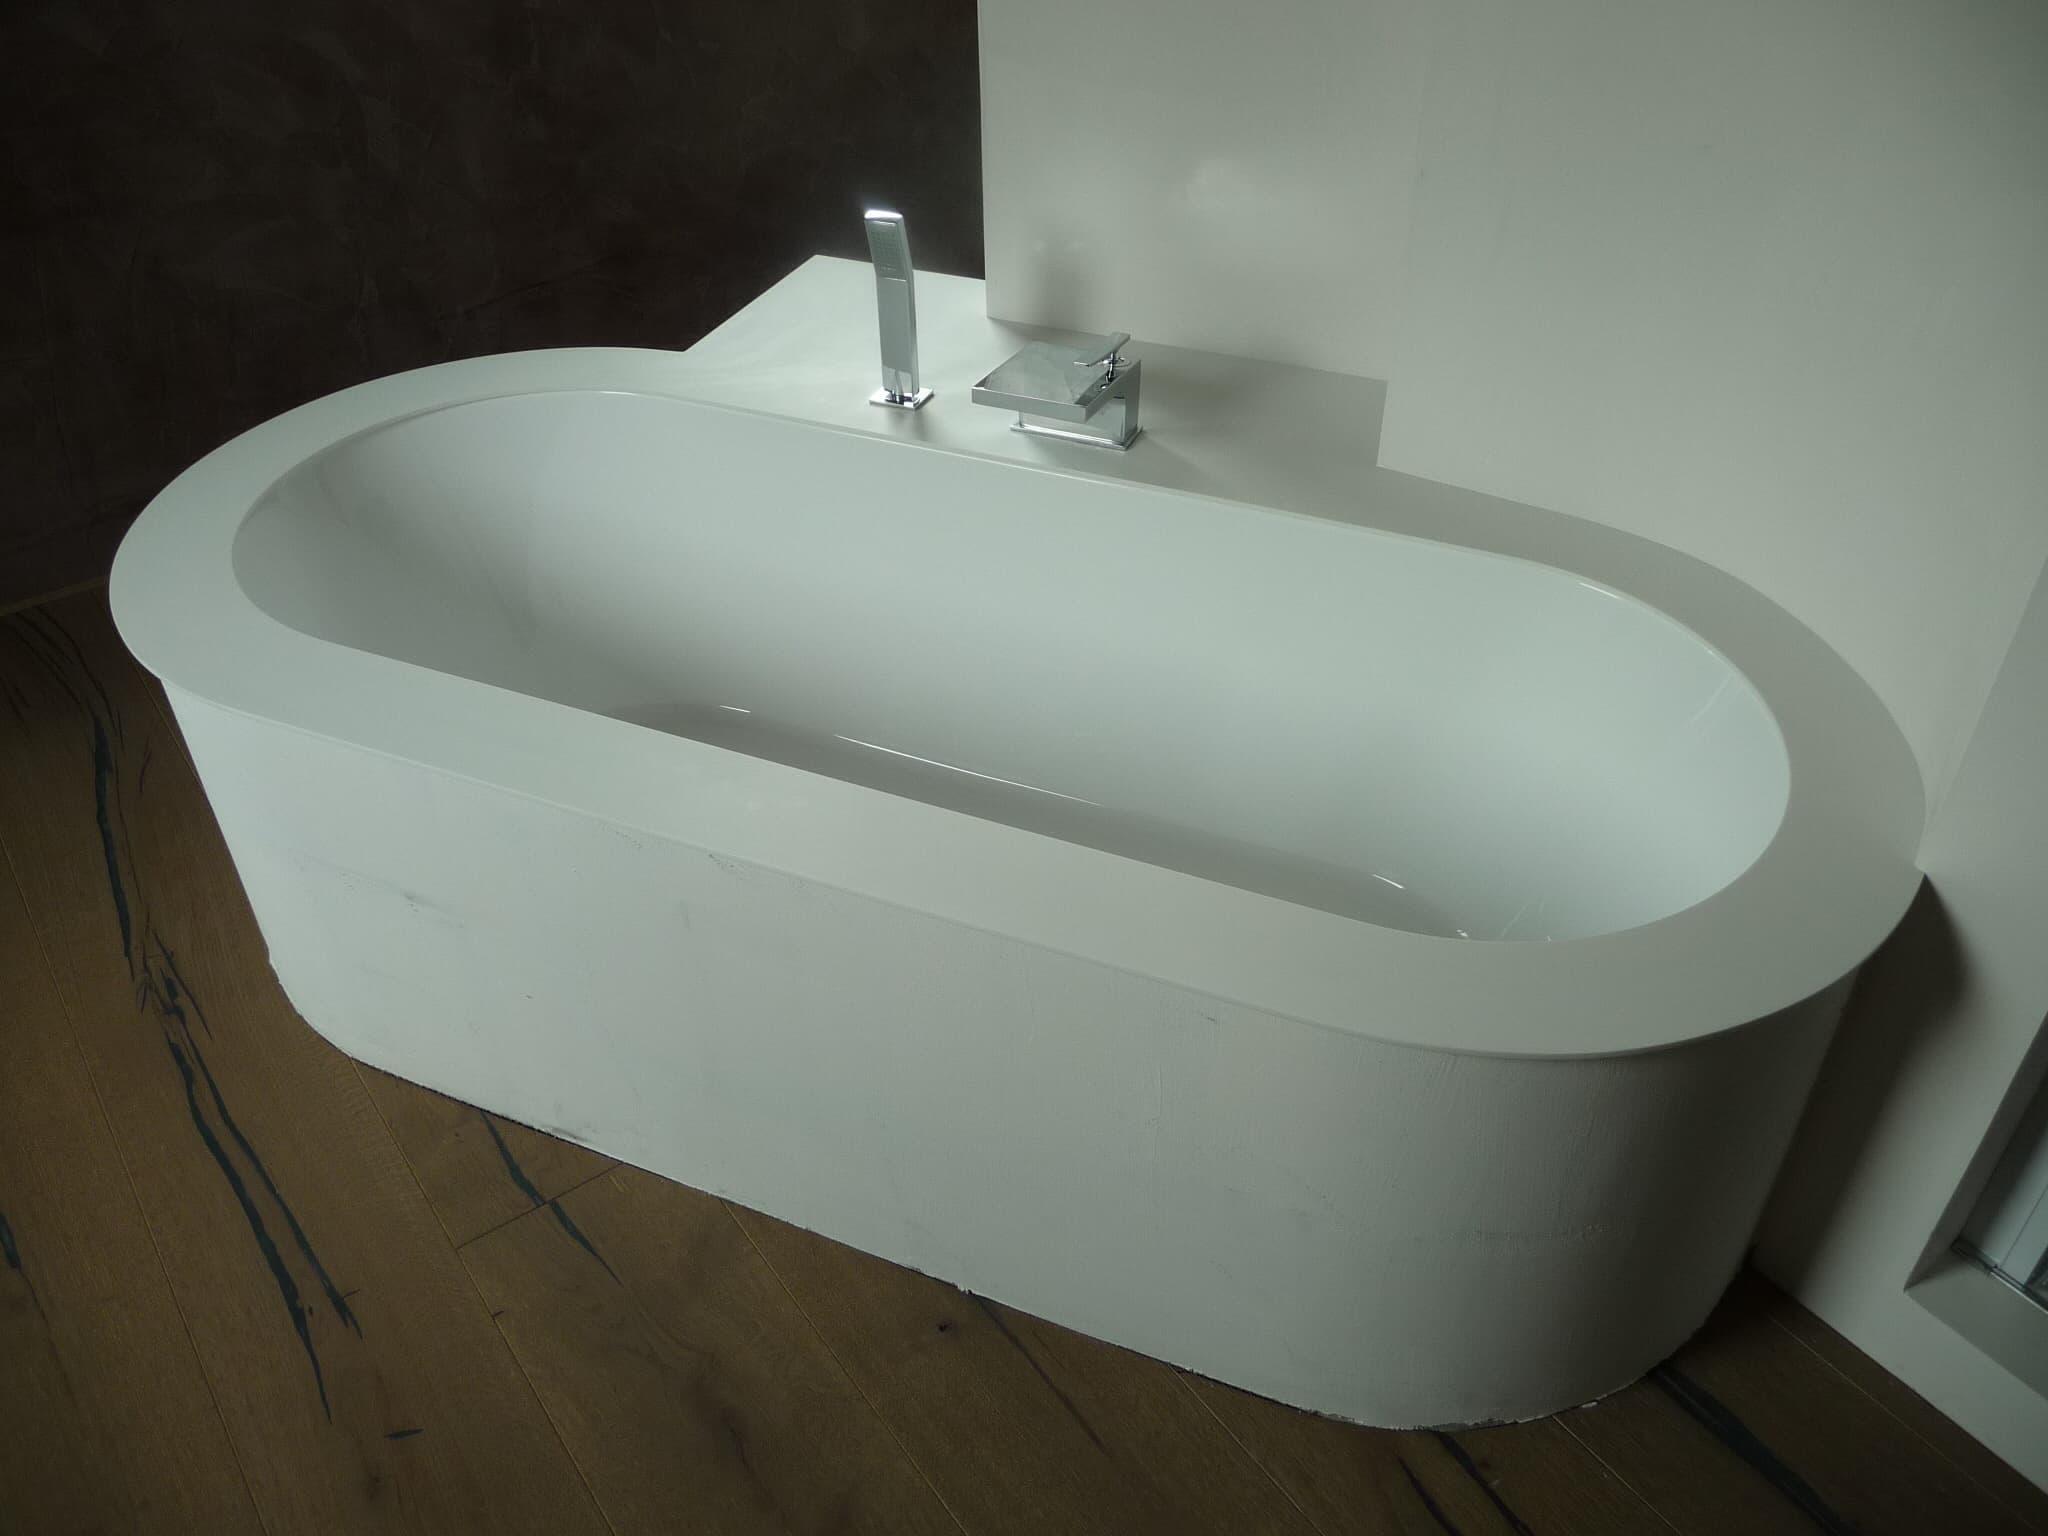 Vasche Da Bagno Varie Misure : Vasche da bagno installazione e manutenzione a venezia